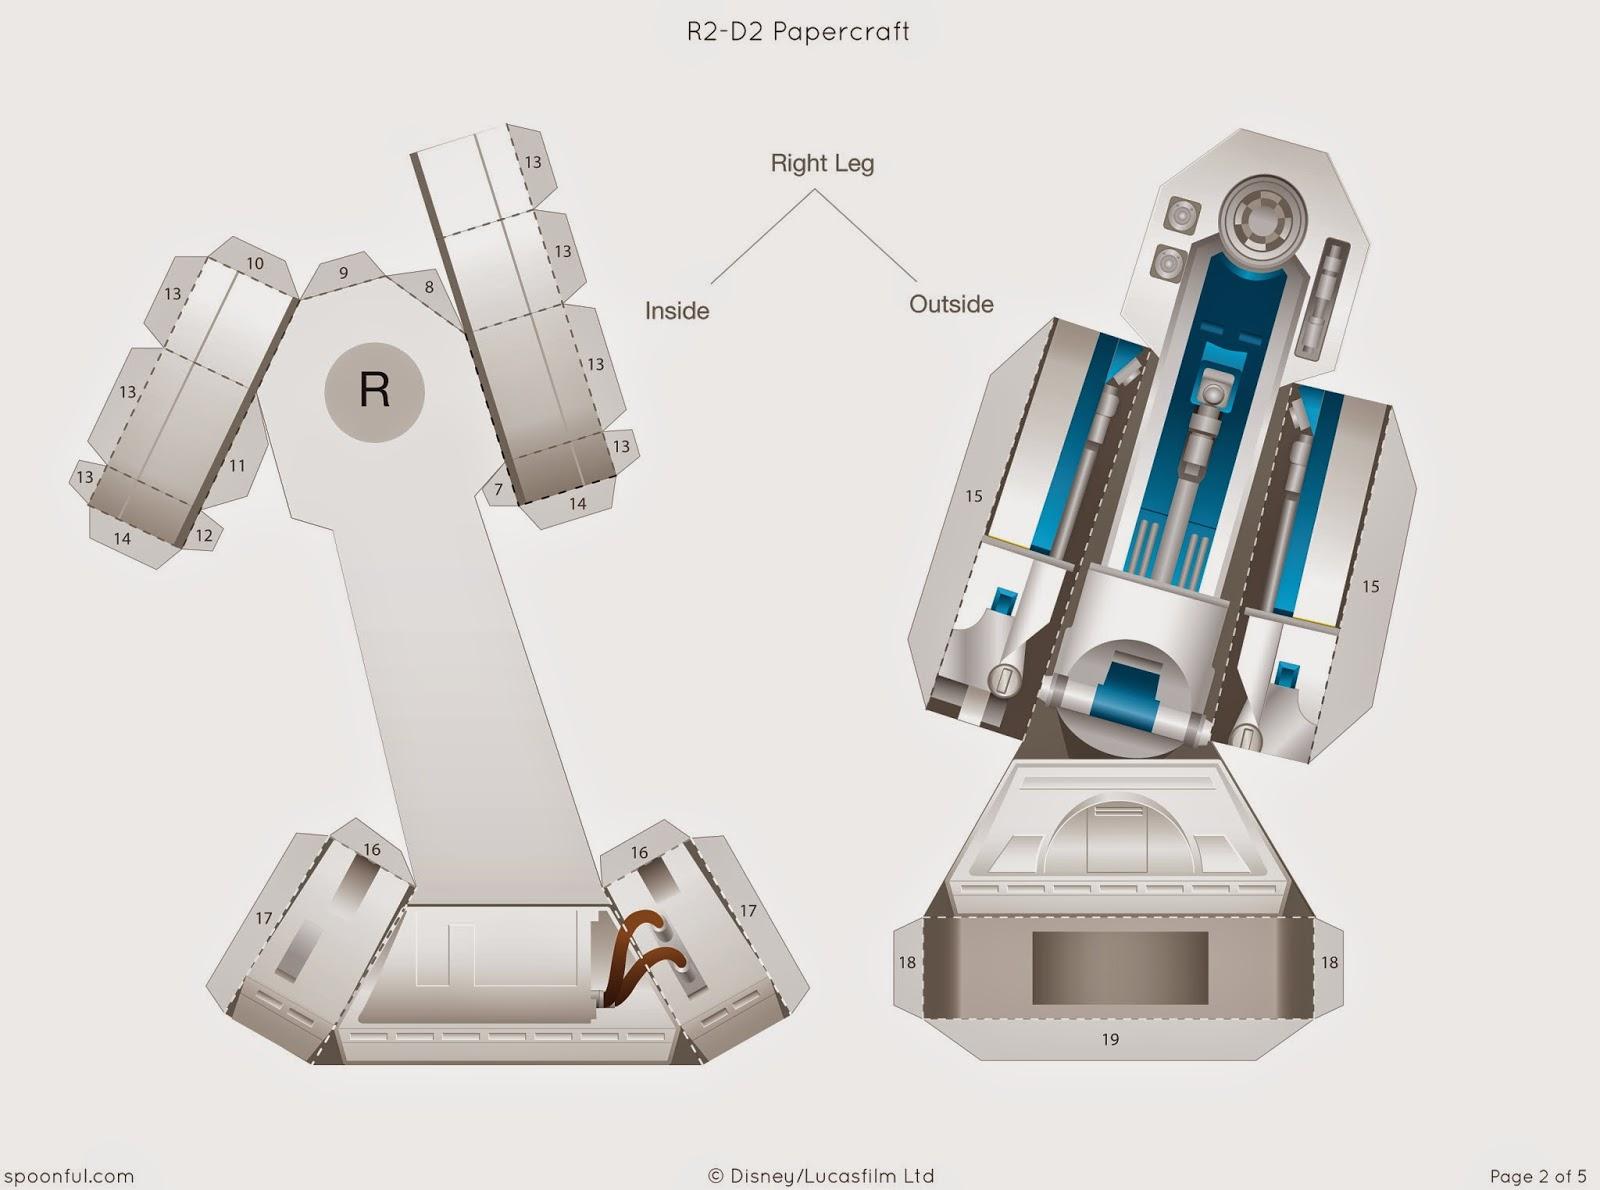 Descargable imprimible de R2-D2 de la saga de Star Wars para maqueta 3d-3